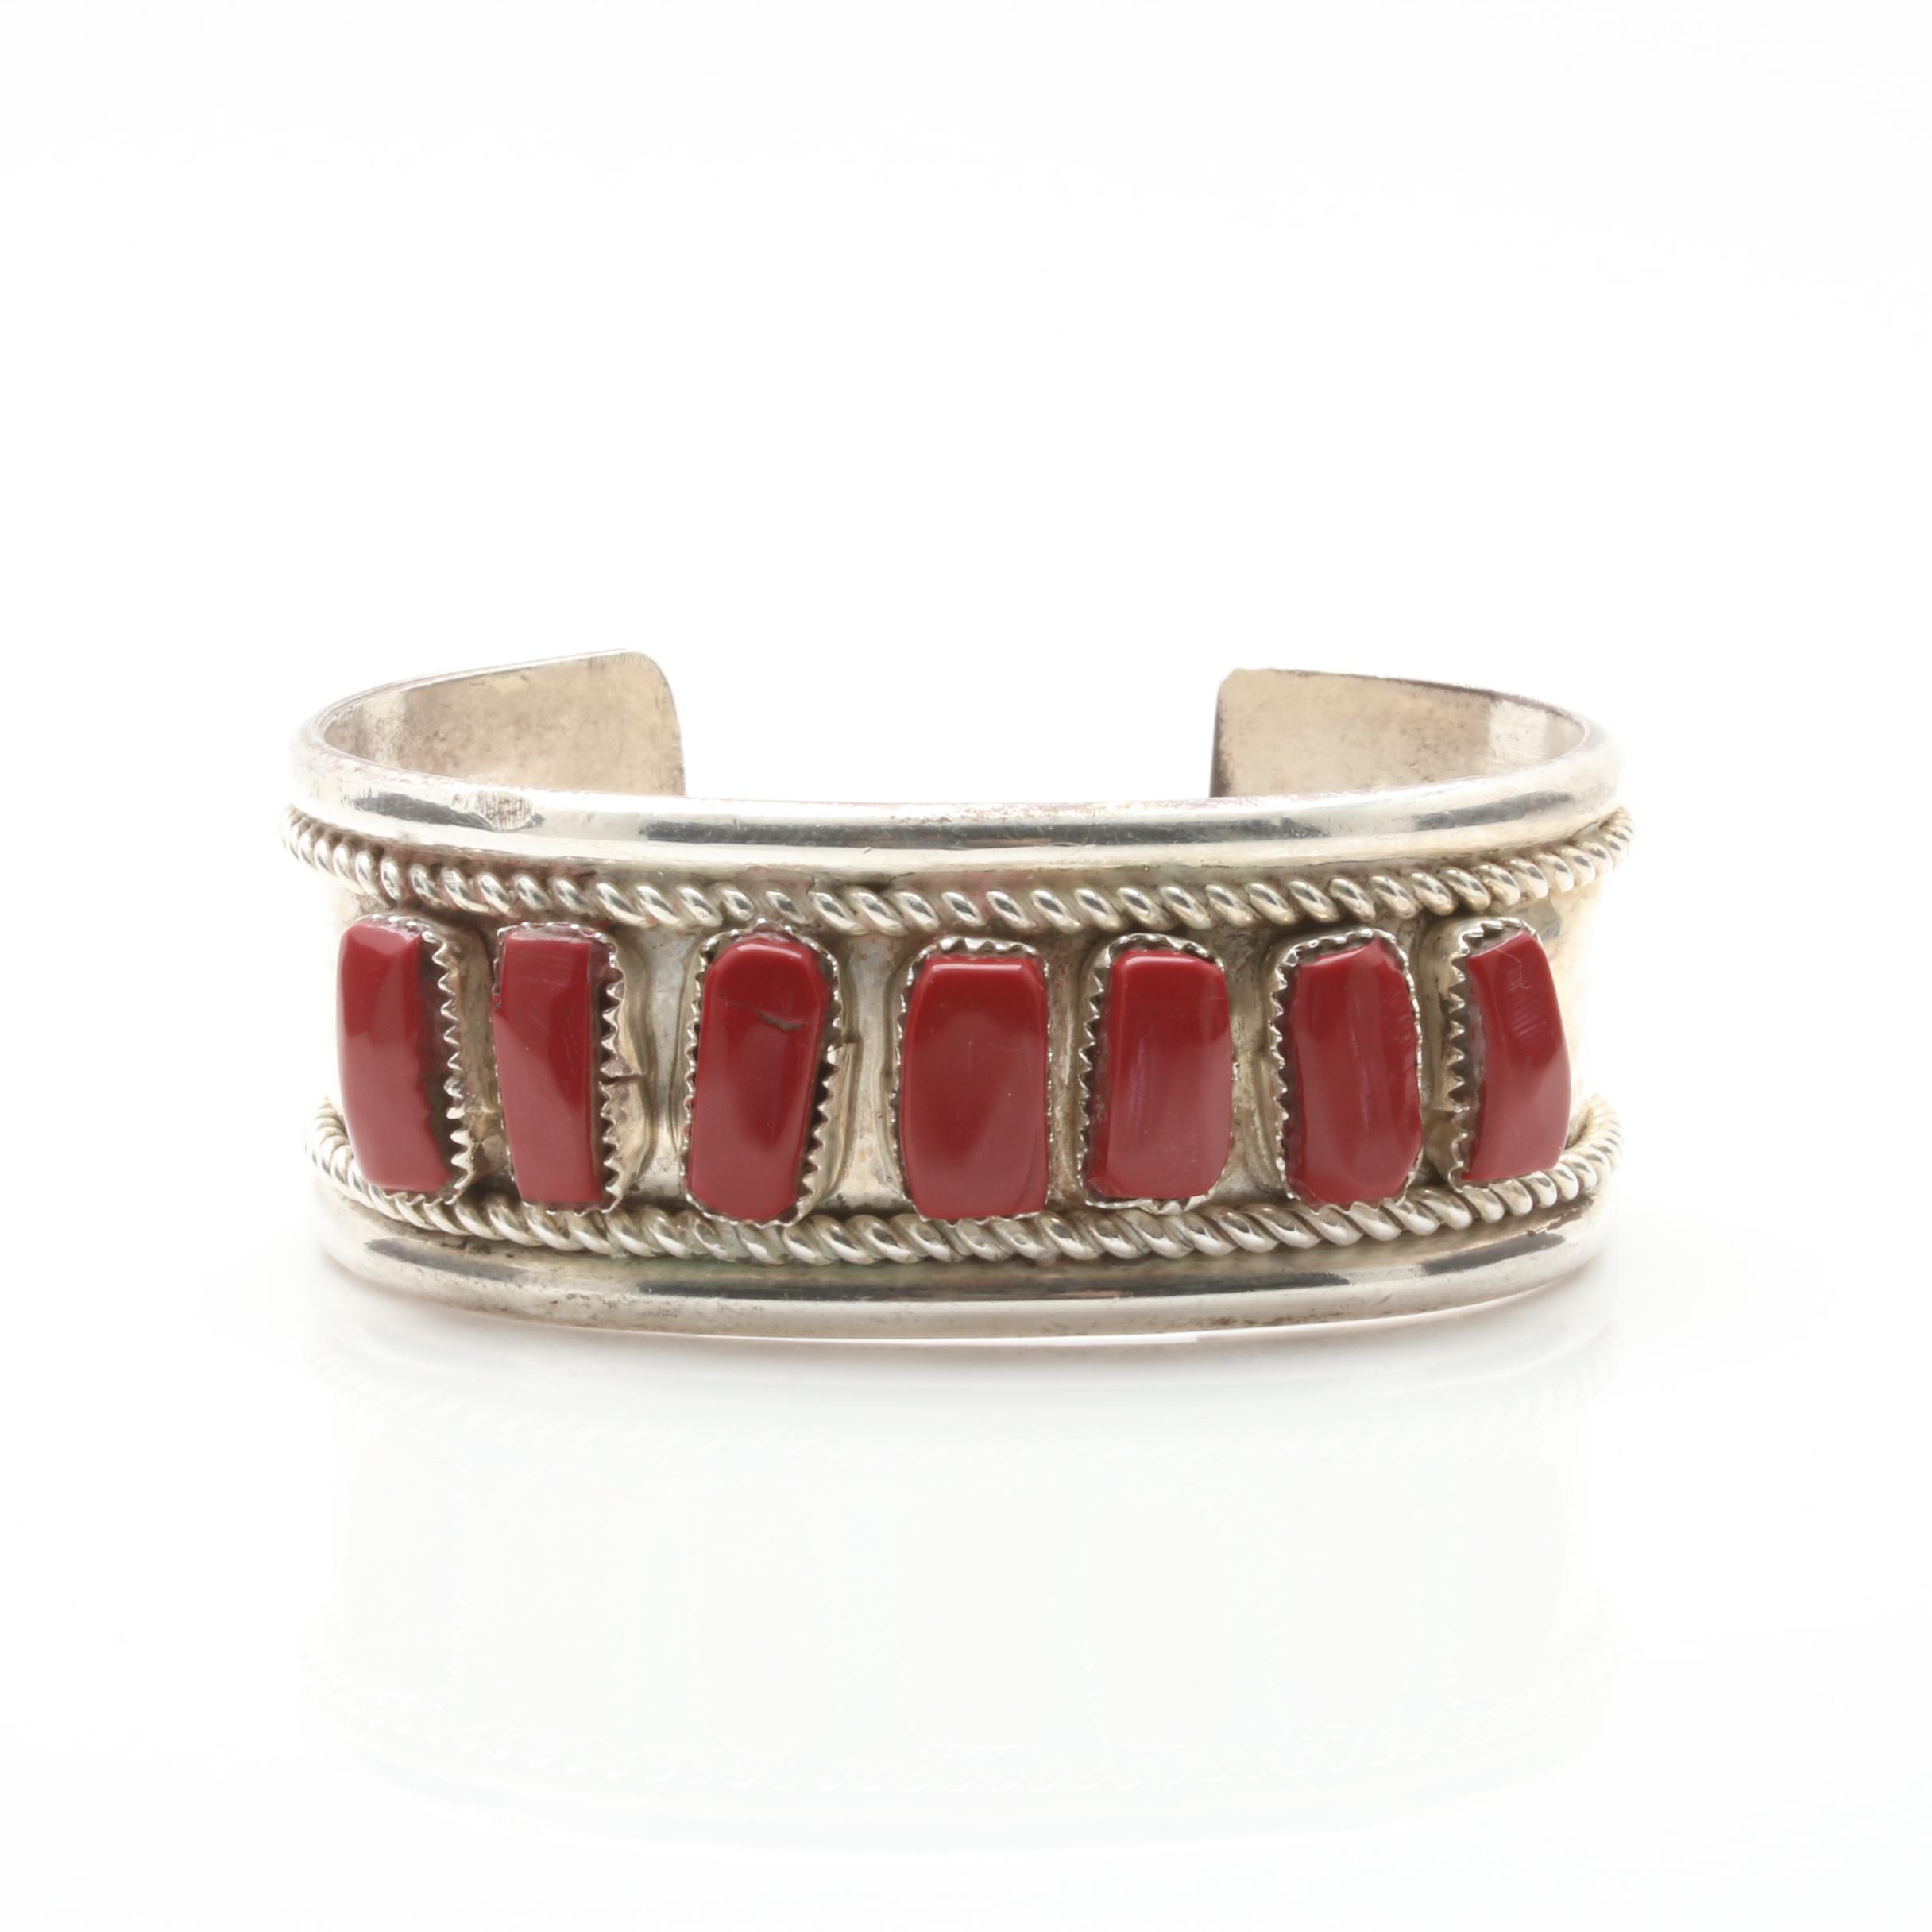 Southwestern Styled Sterling Silver Imitation Coral Cuff Bracelet